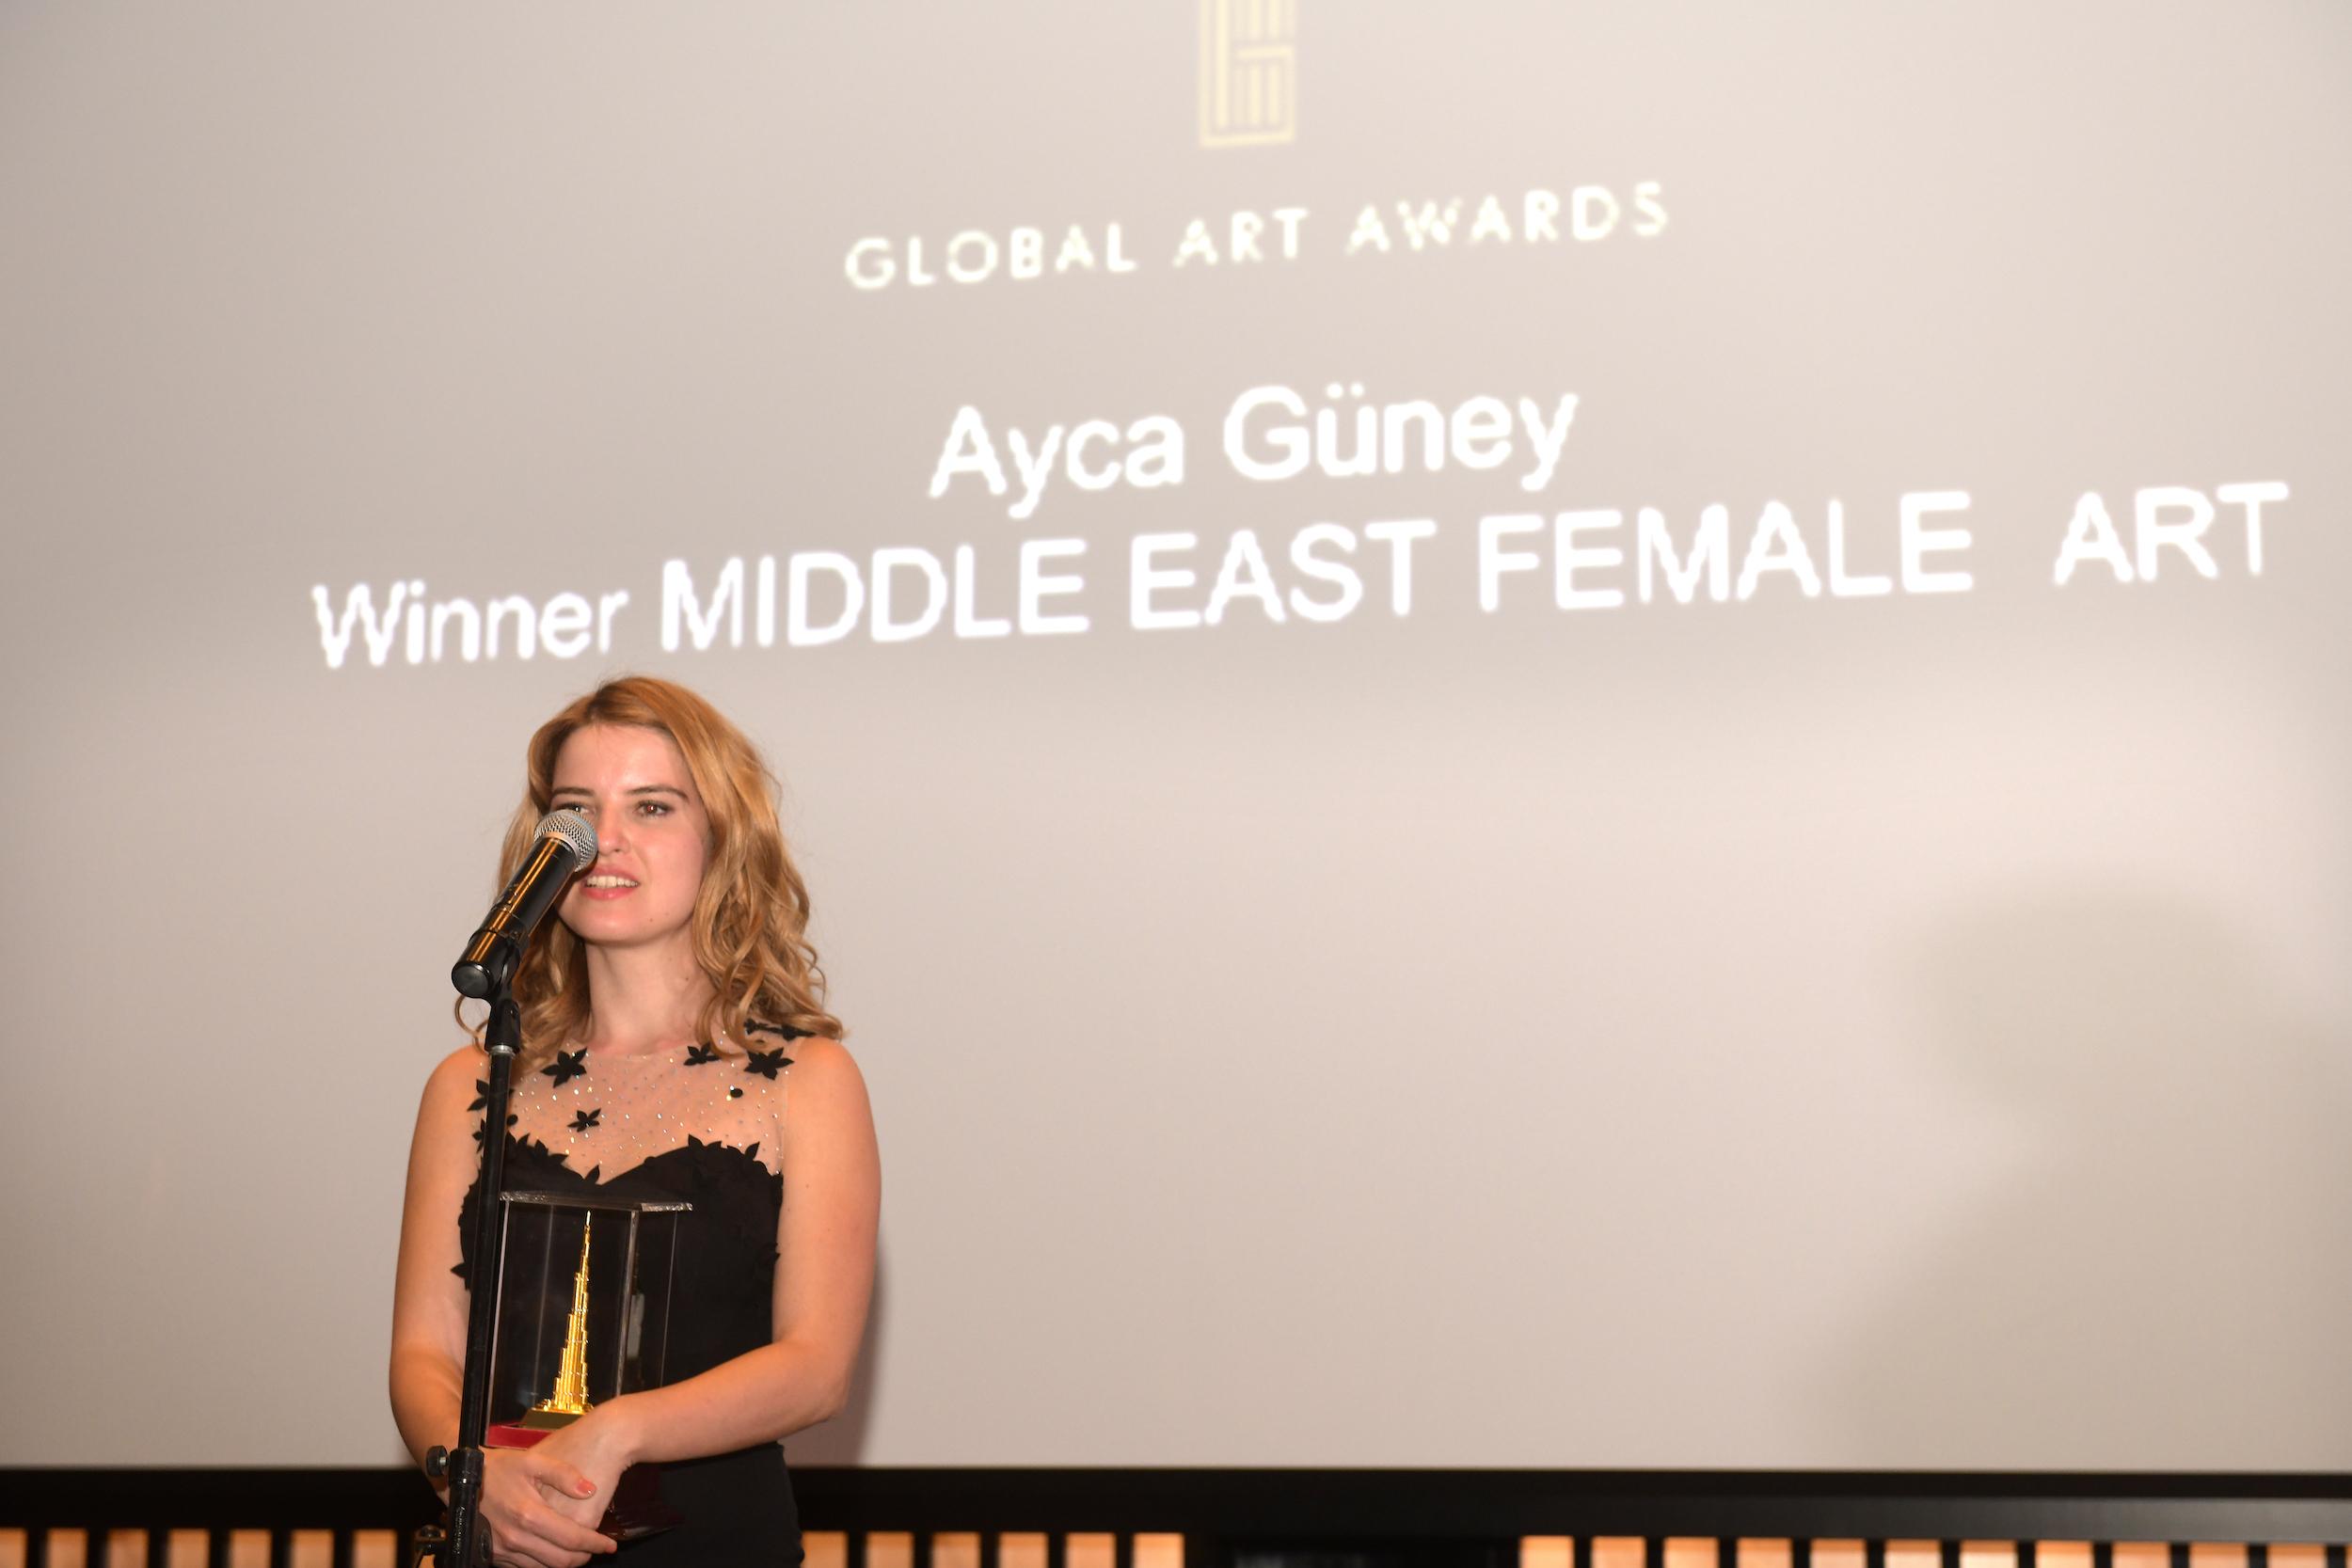 MIDDLE EAST FEMALE ART AWARD   AYCA GÜNEY (TURKEY)